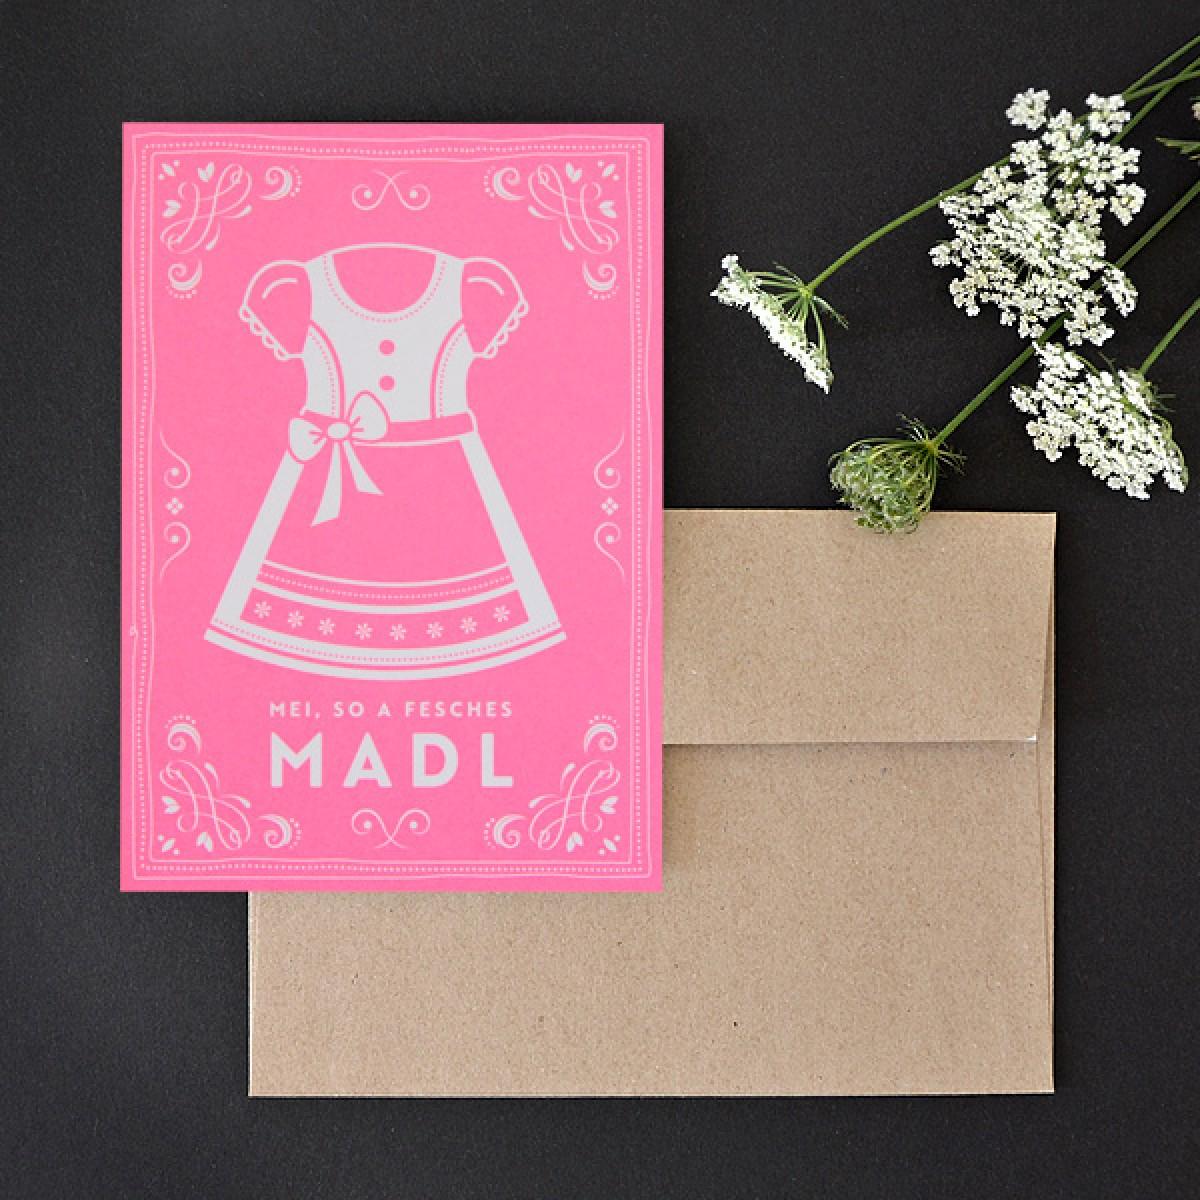 MADL neon-rosé // Klappkarte inkl. Naturpapierkuvert